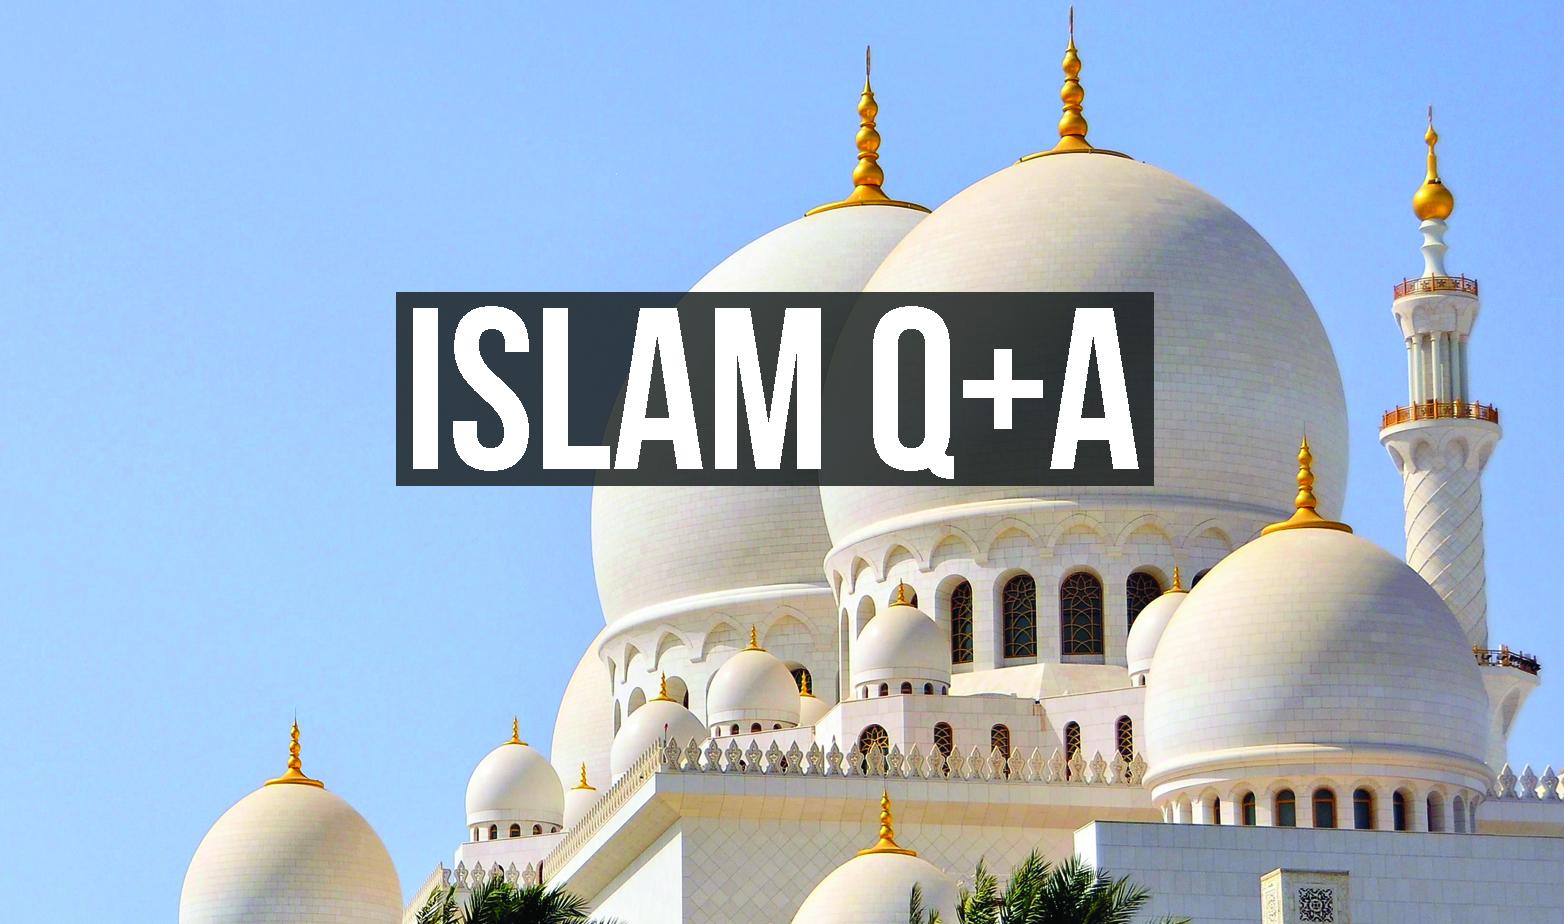 Islam, Muslim fashion, muslim mosque, mosque, islam questions